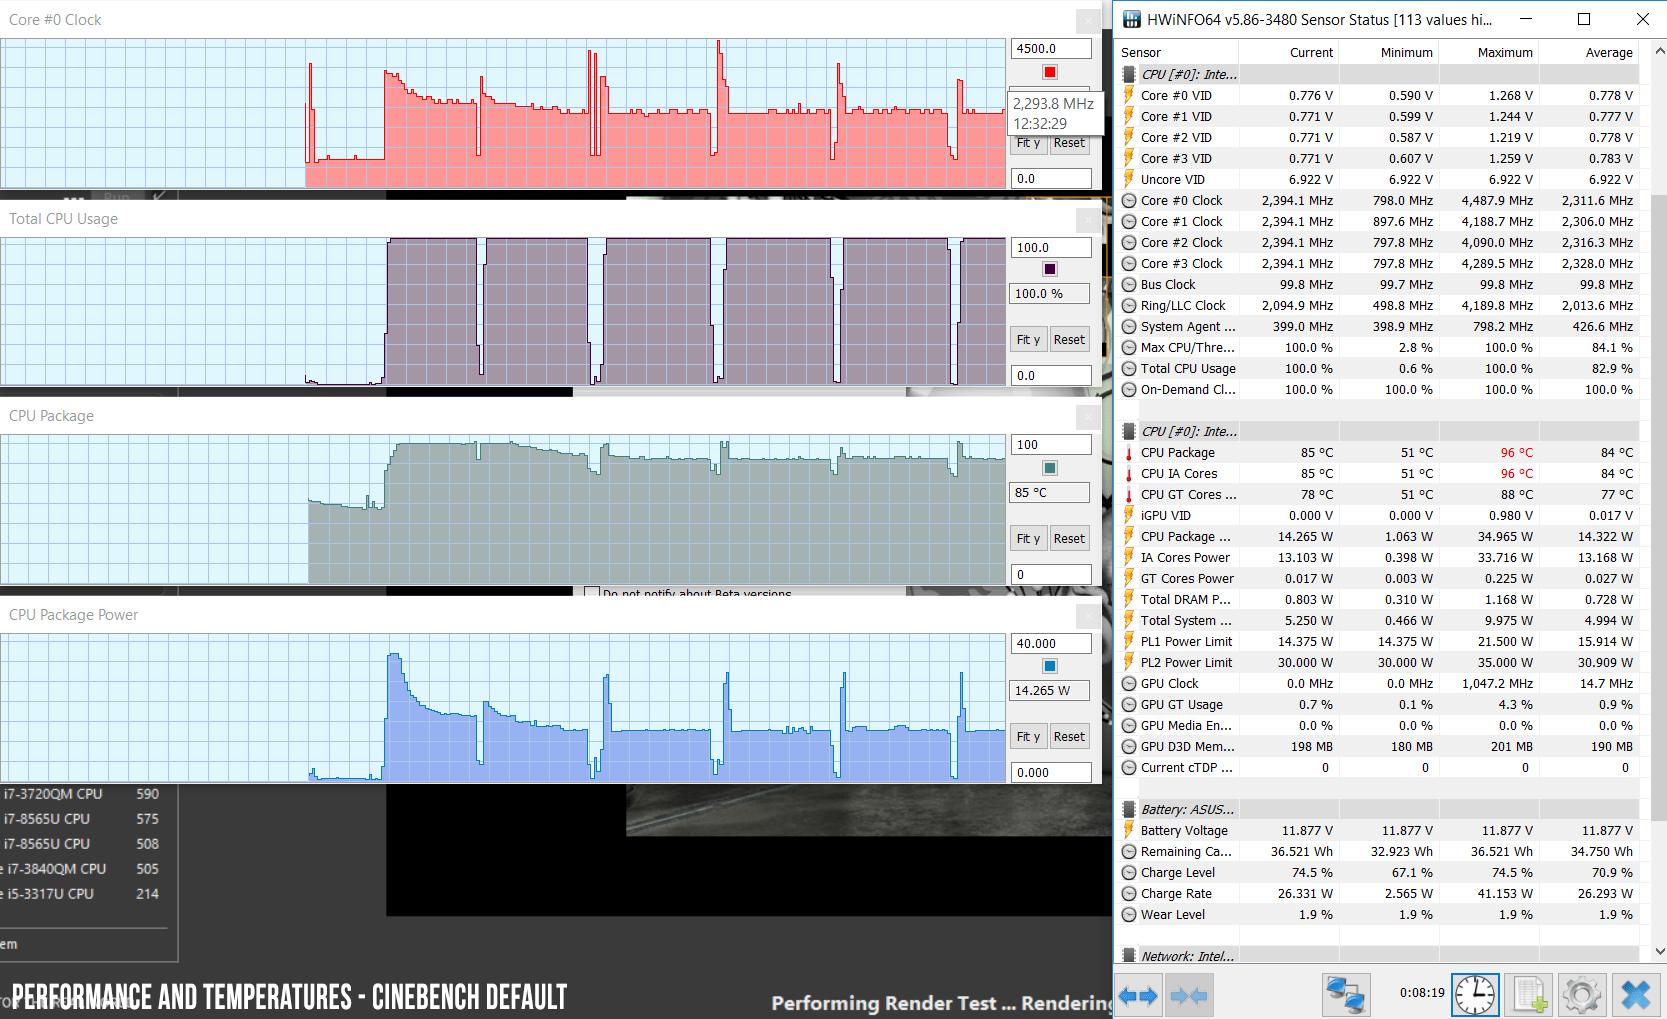 Intel Core i7-8565U benchmarks (Whiskey Lake U) - vs i7-8550U. i5-8265U and others